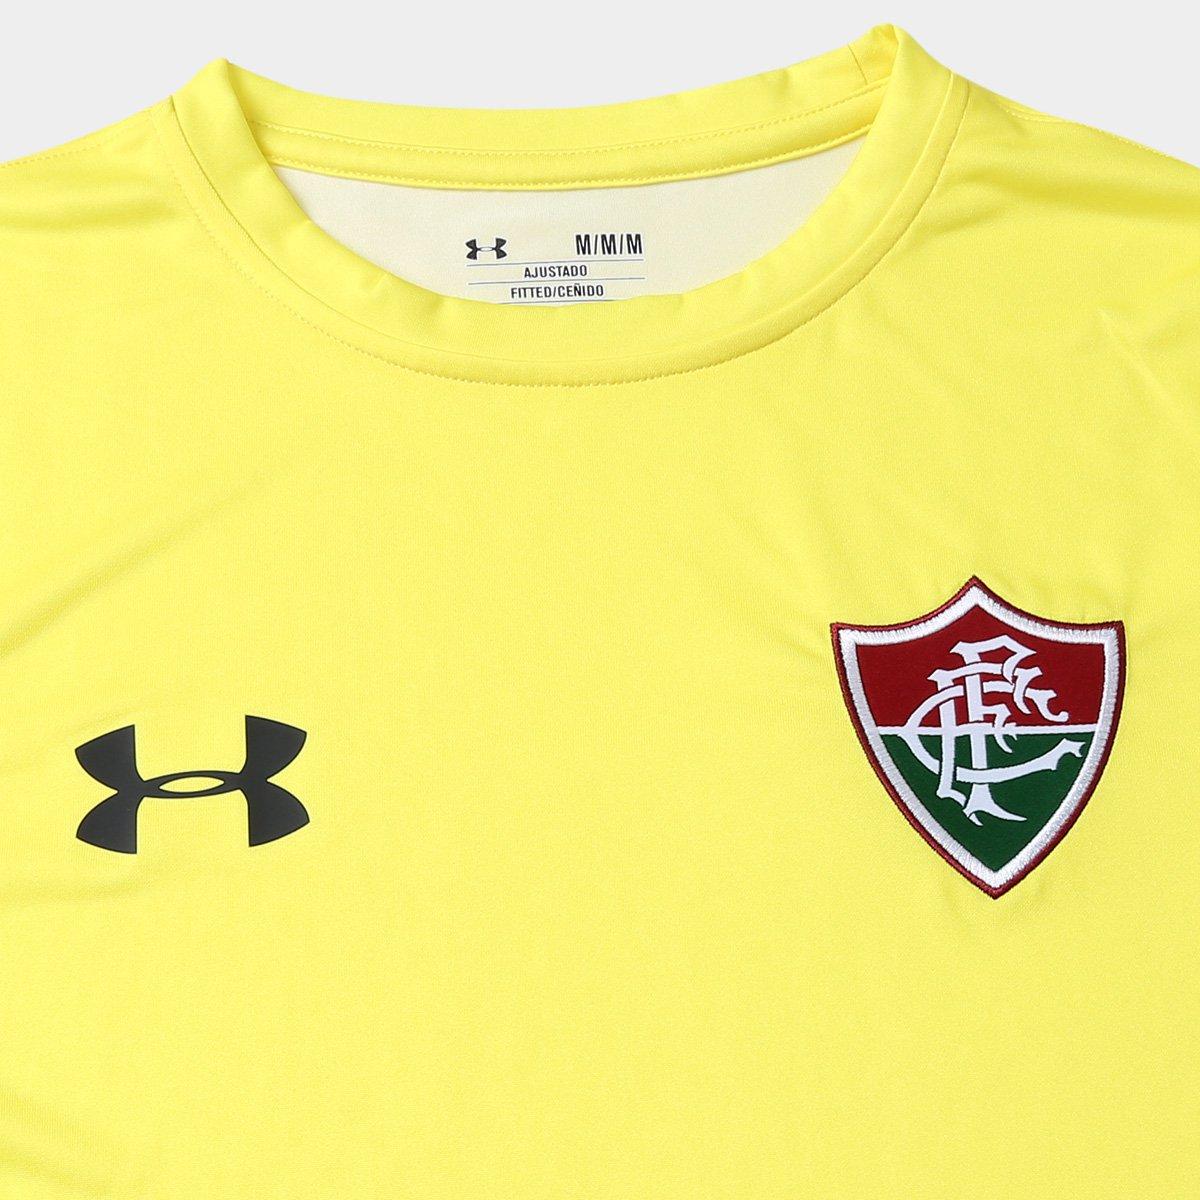 Camisa Fluminense I 17 18 s nº Torcedor Under Armour Masculina ... 27ffa6d243336